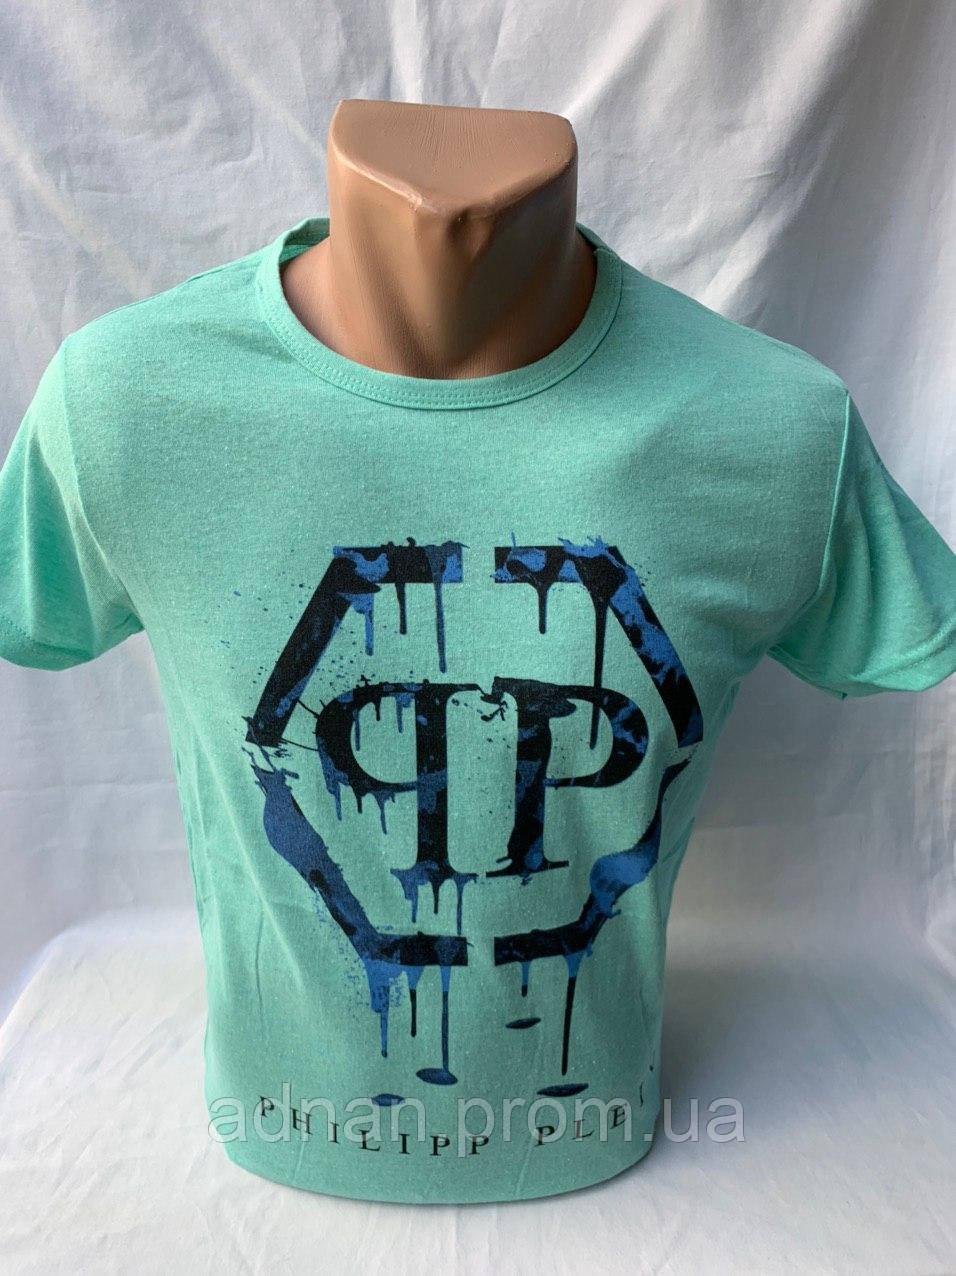 Футболка мужская фирмы KLAS 23 х/б PHILIPP PLEIN 005 \ купить футболку мужскую оптом